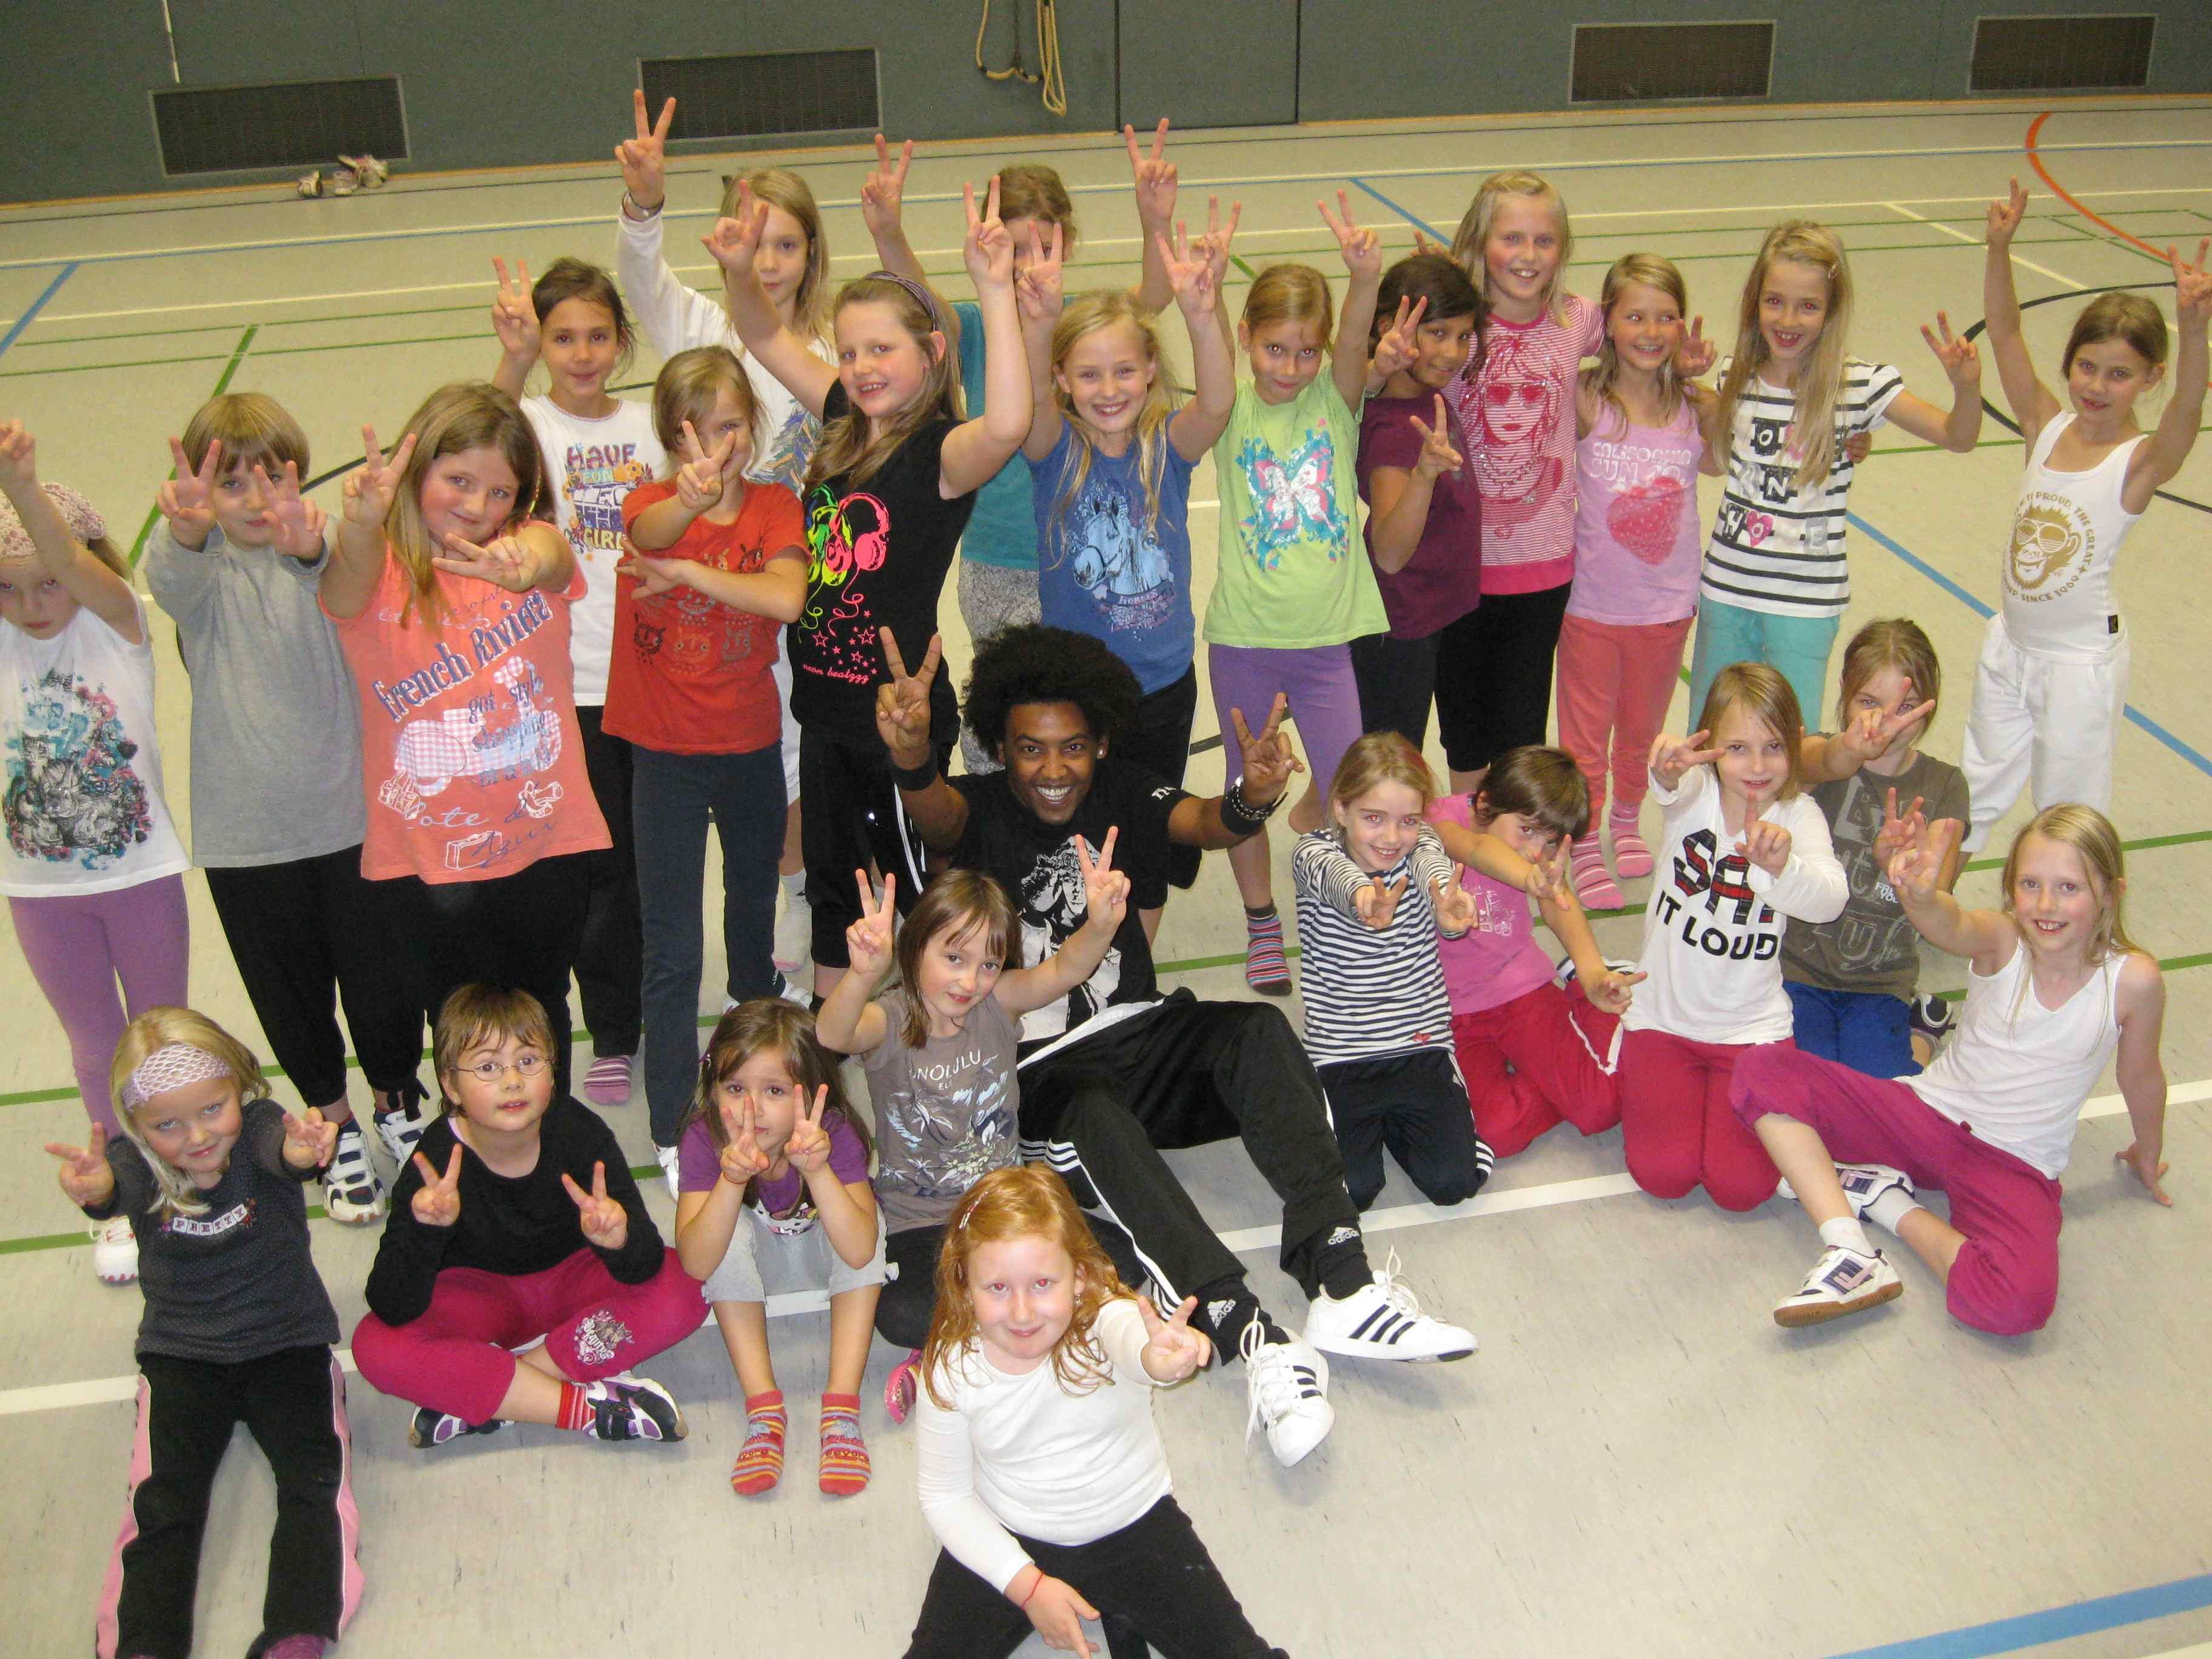 Hip Hop Kurse beim TuS Johannland: Power und Ausstrahlung bei Choreograph Alexes Feelmo